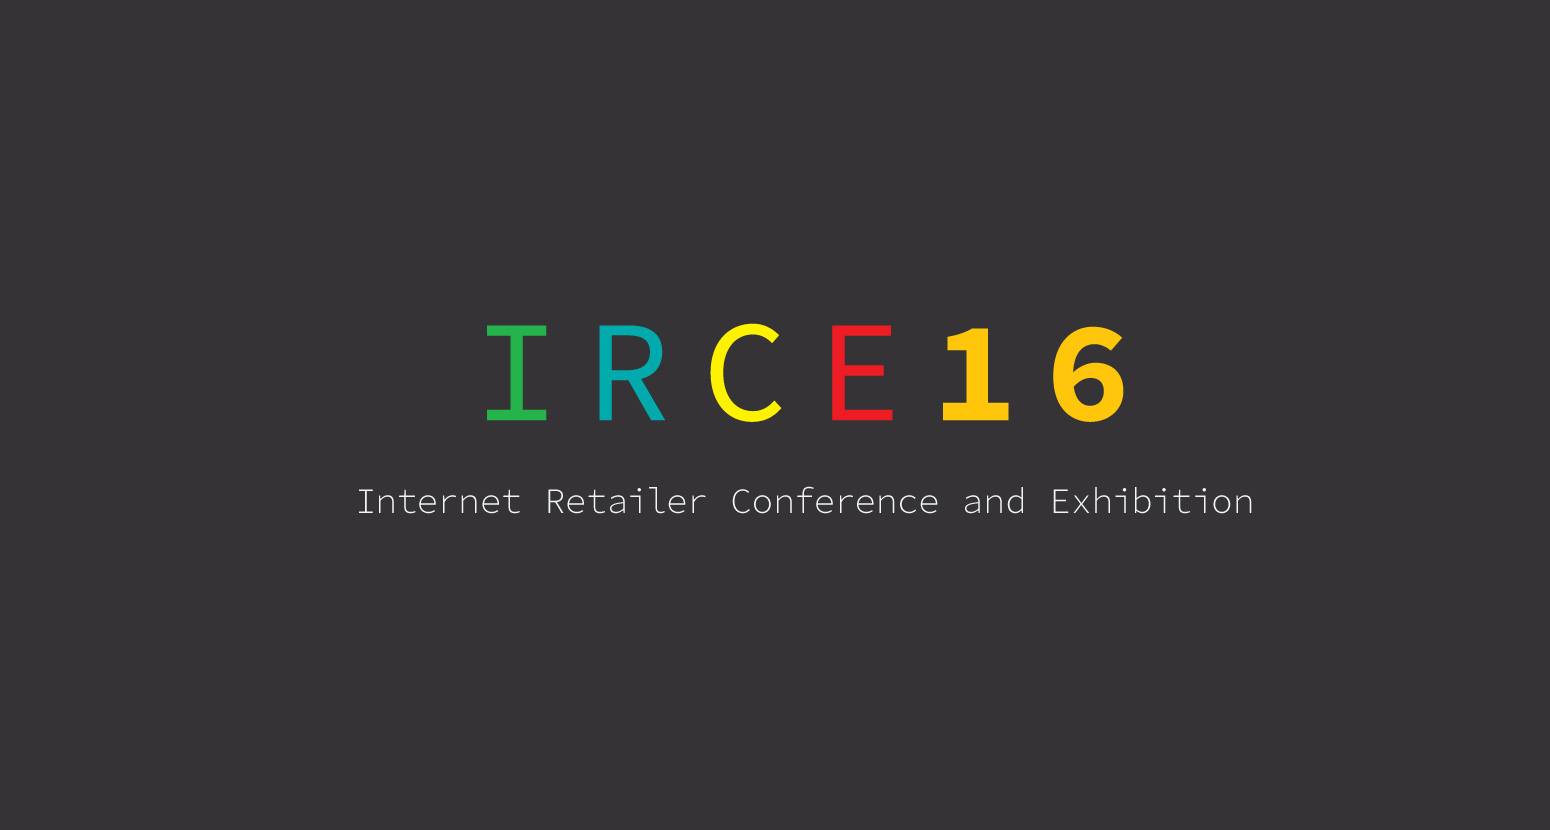 irce-2016@2x